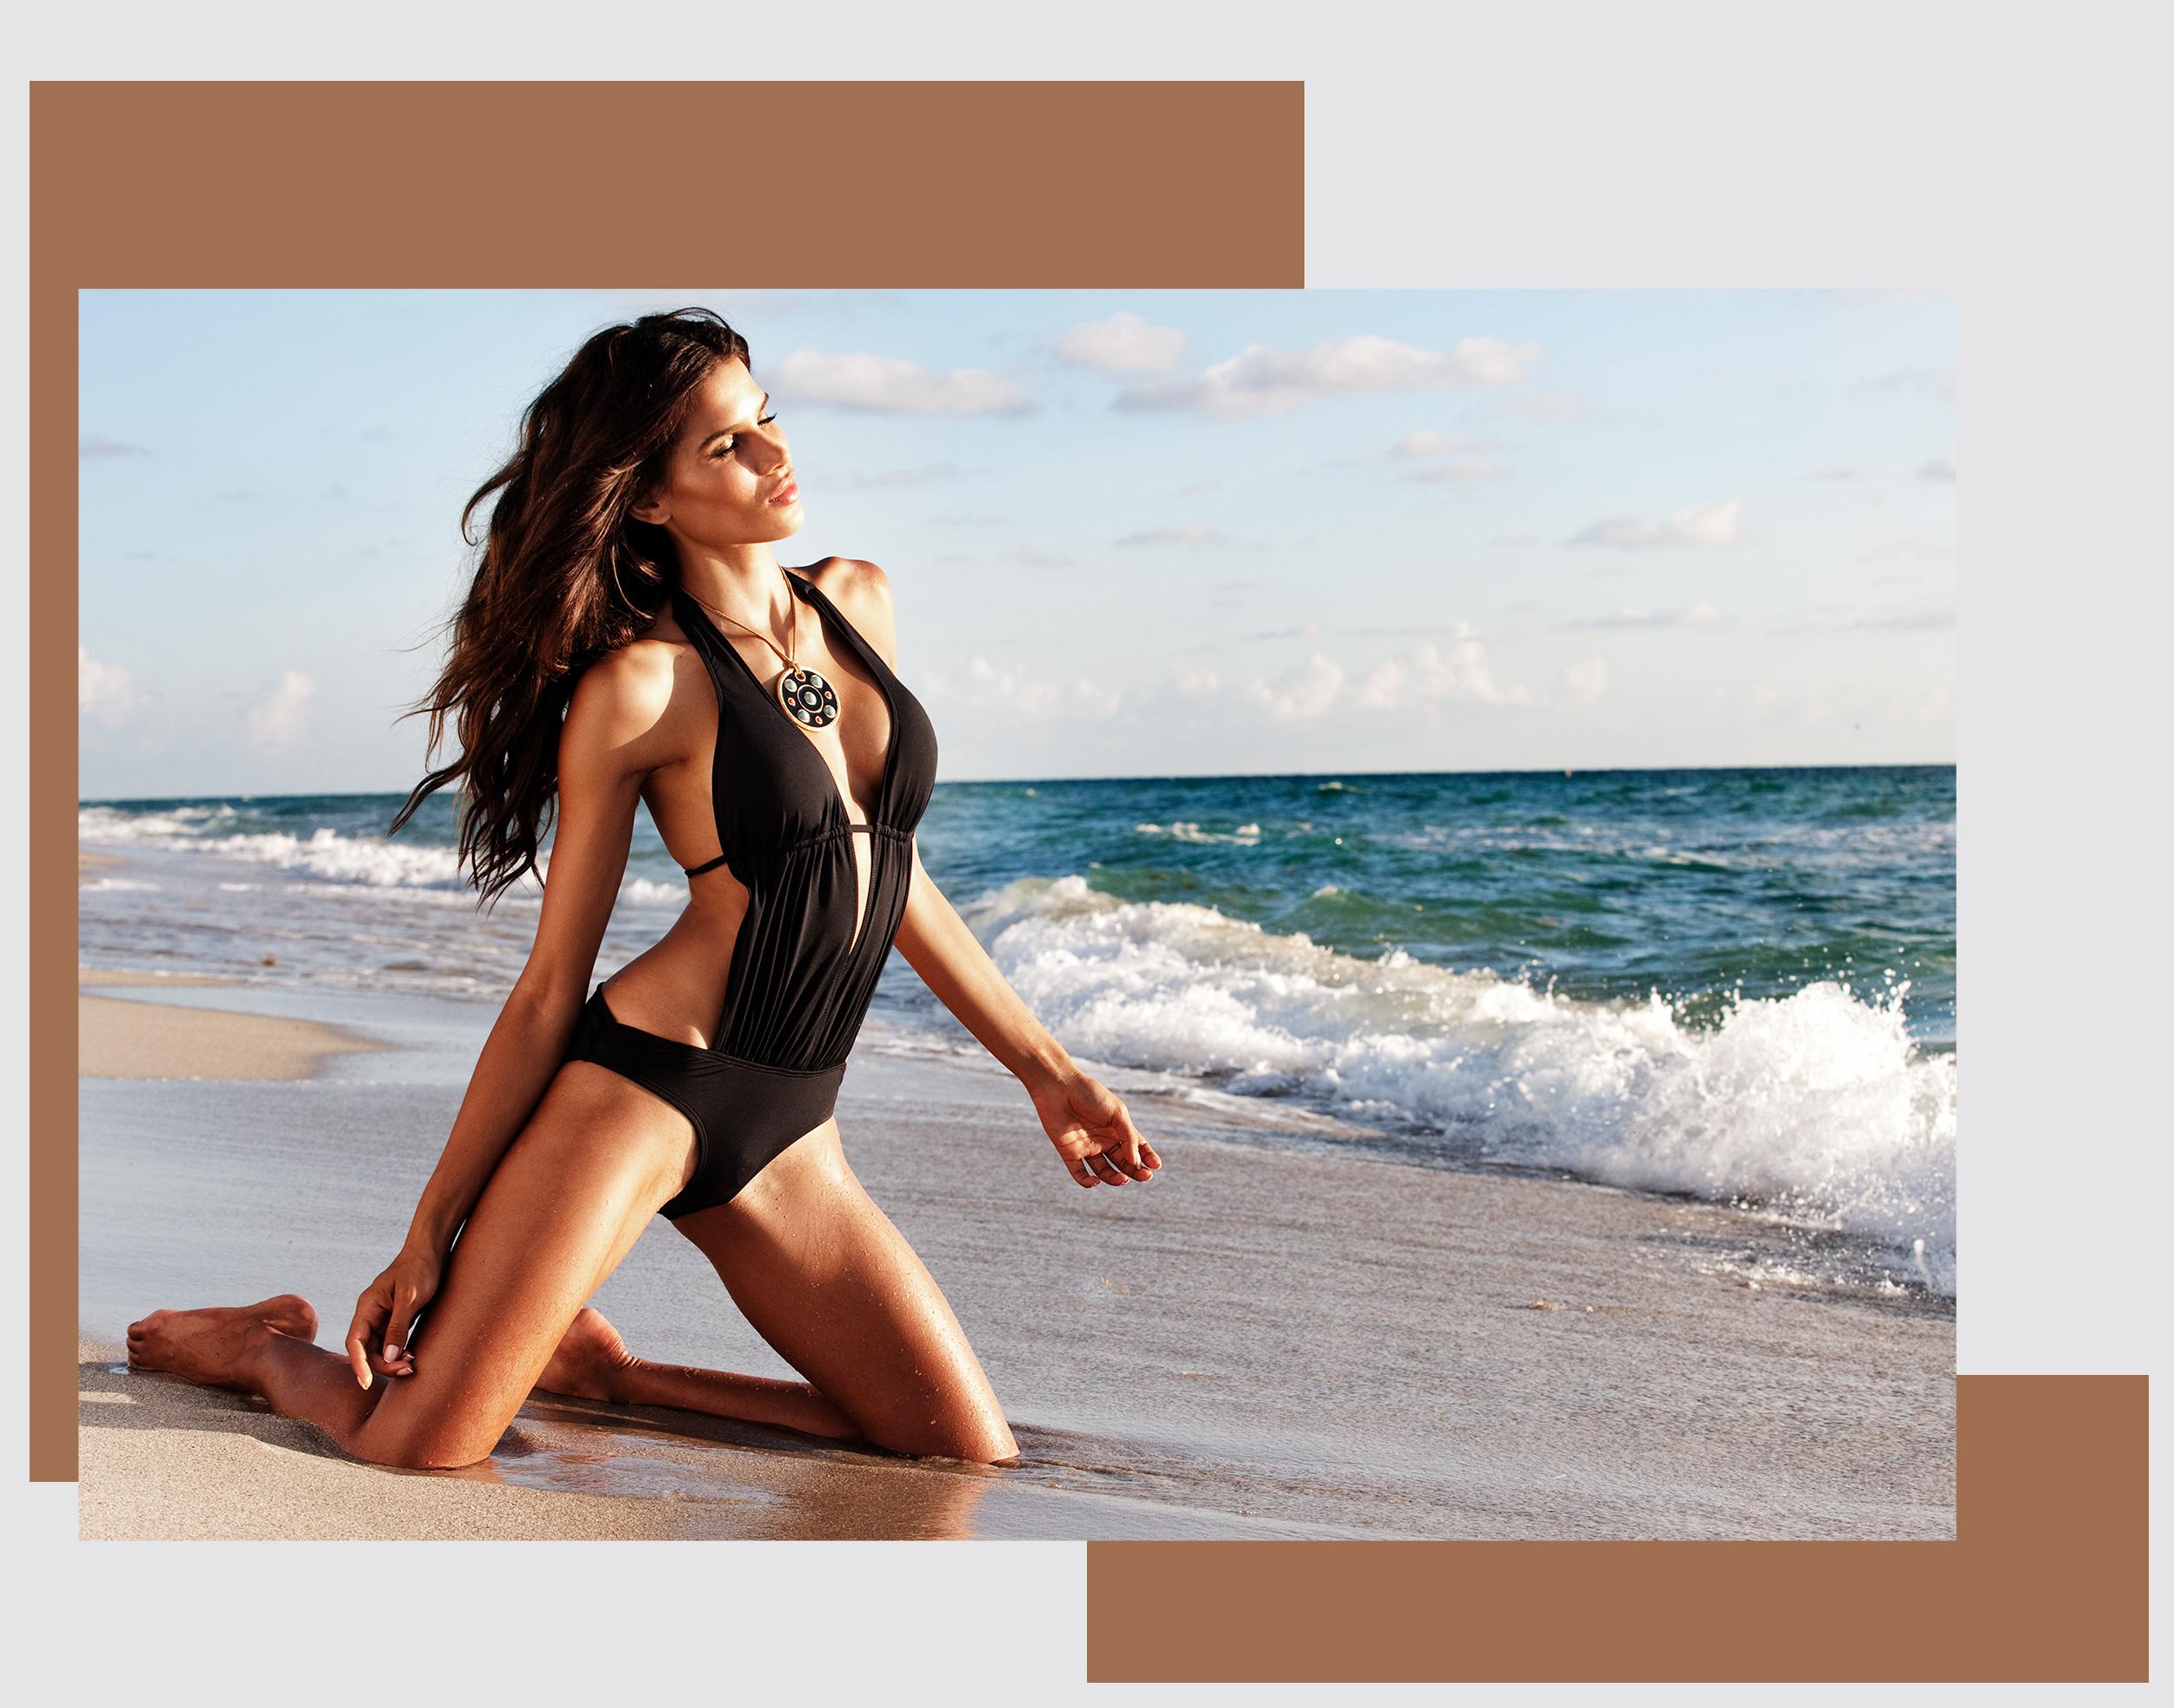 Advertising_Fashion_Swim_08.jpg